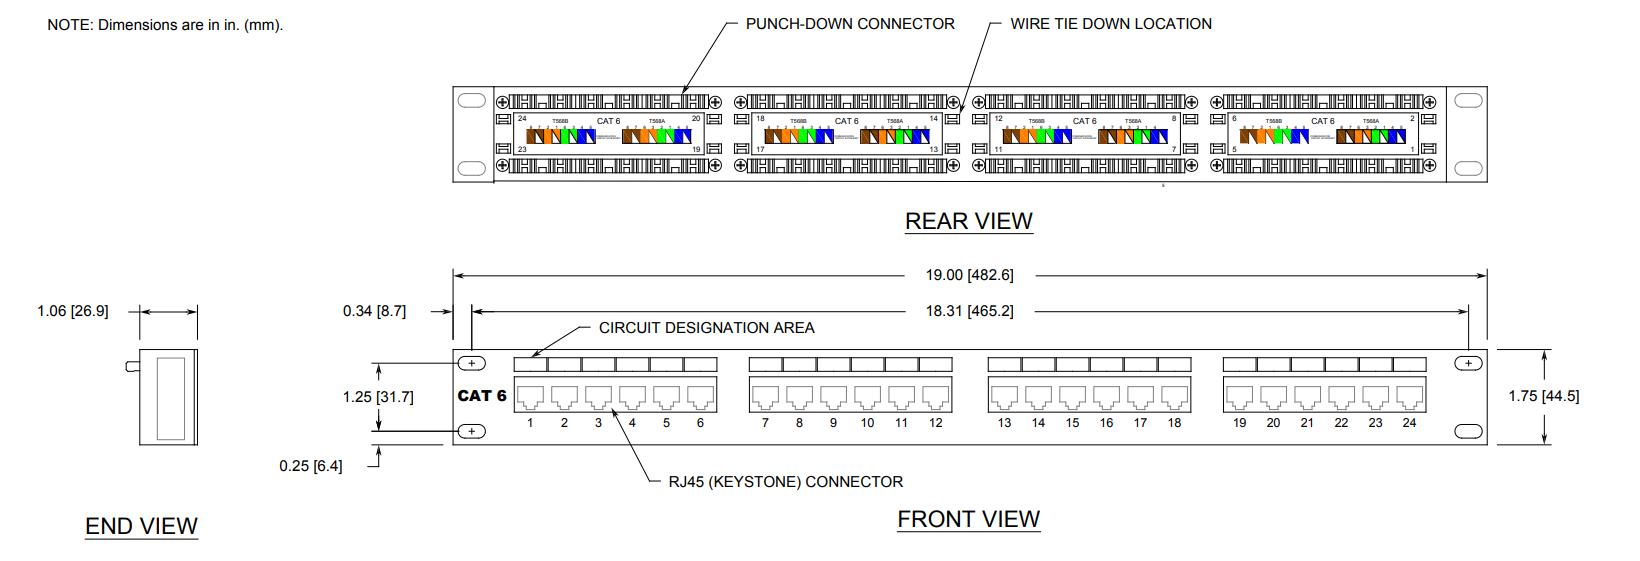 24 Port Patch Panel Dimensions